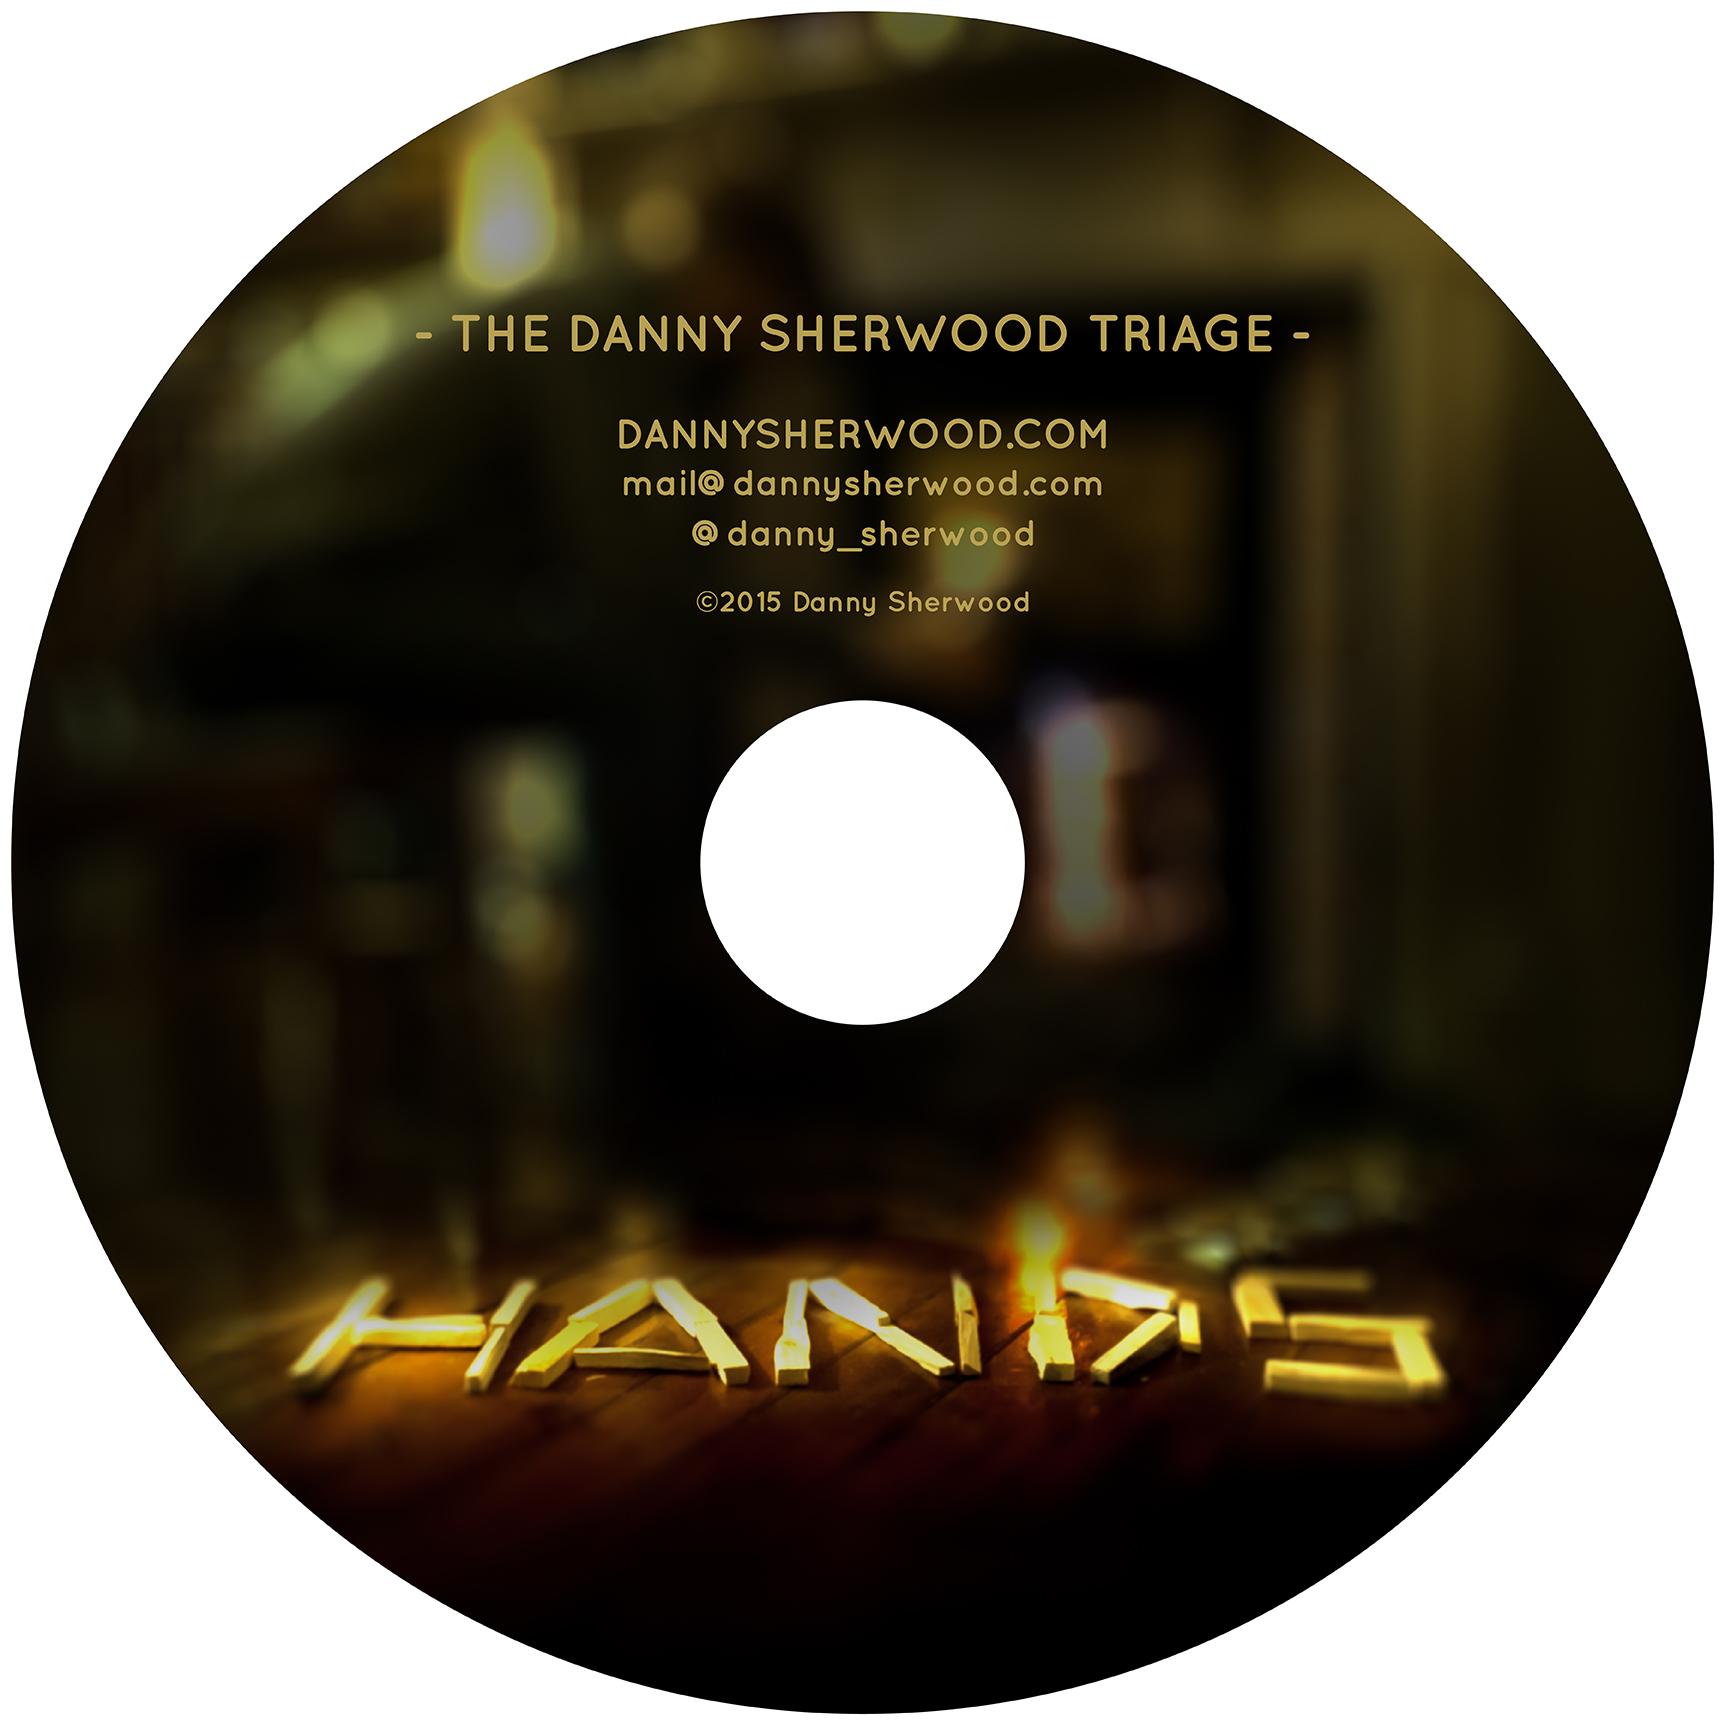 hands-cd-cover_martinbrooks.jpg